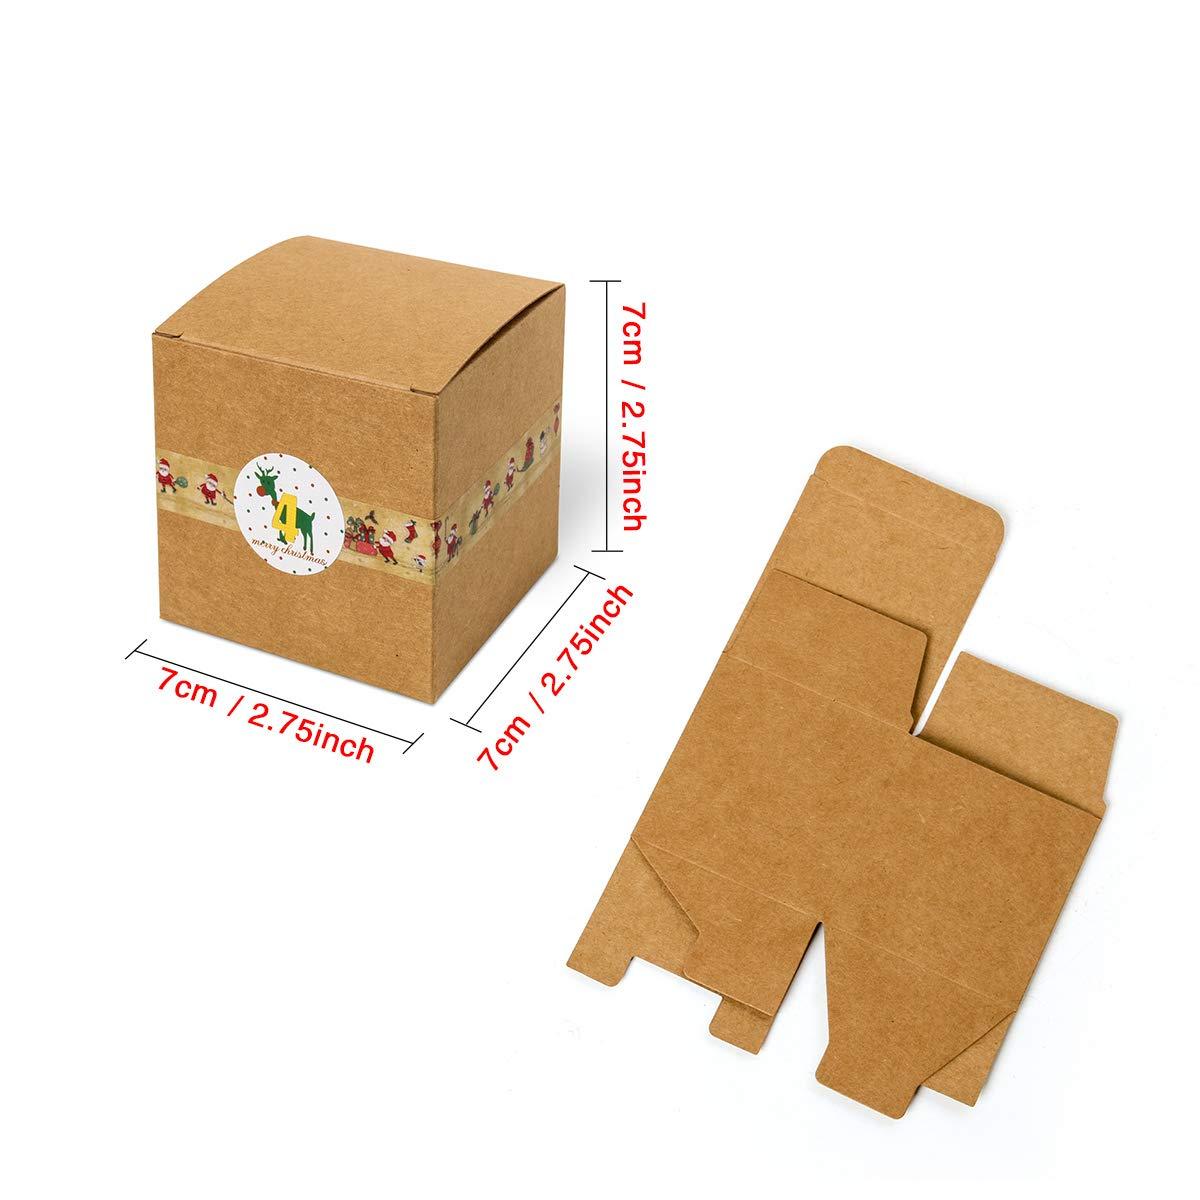 Cusfull Adventskalender Diy Set 24 Packpapier Boxen Zum Selber